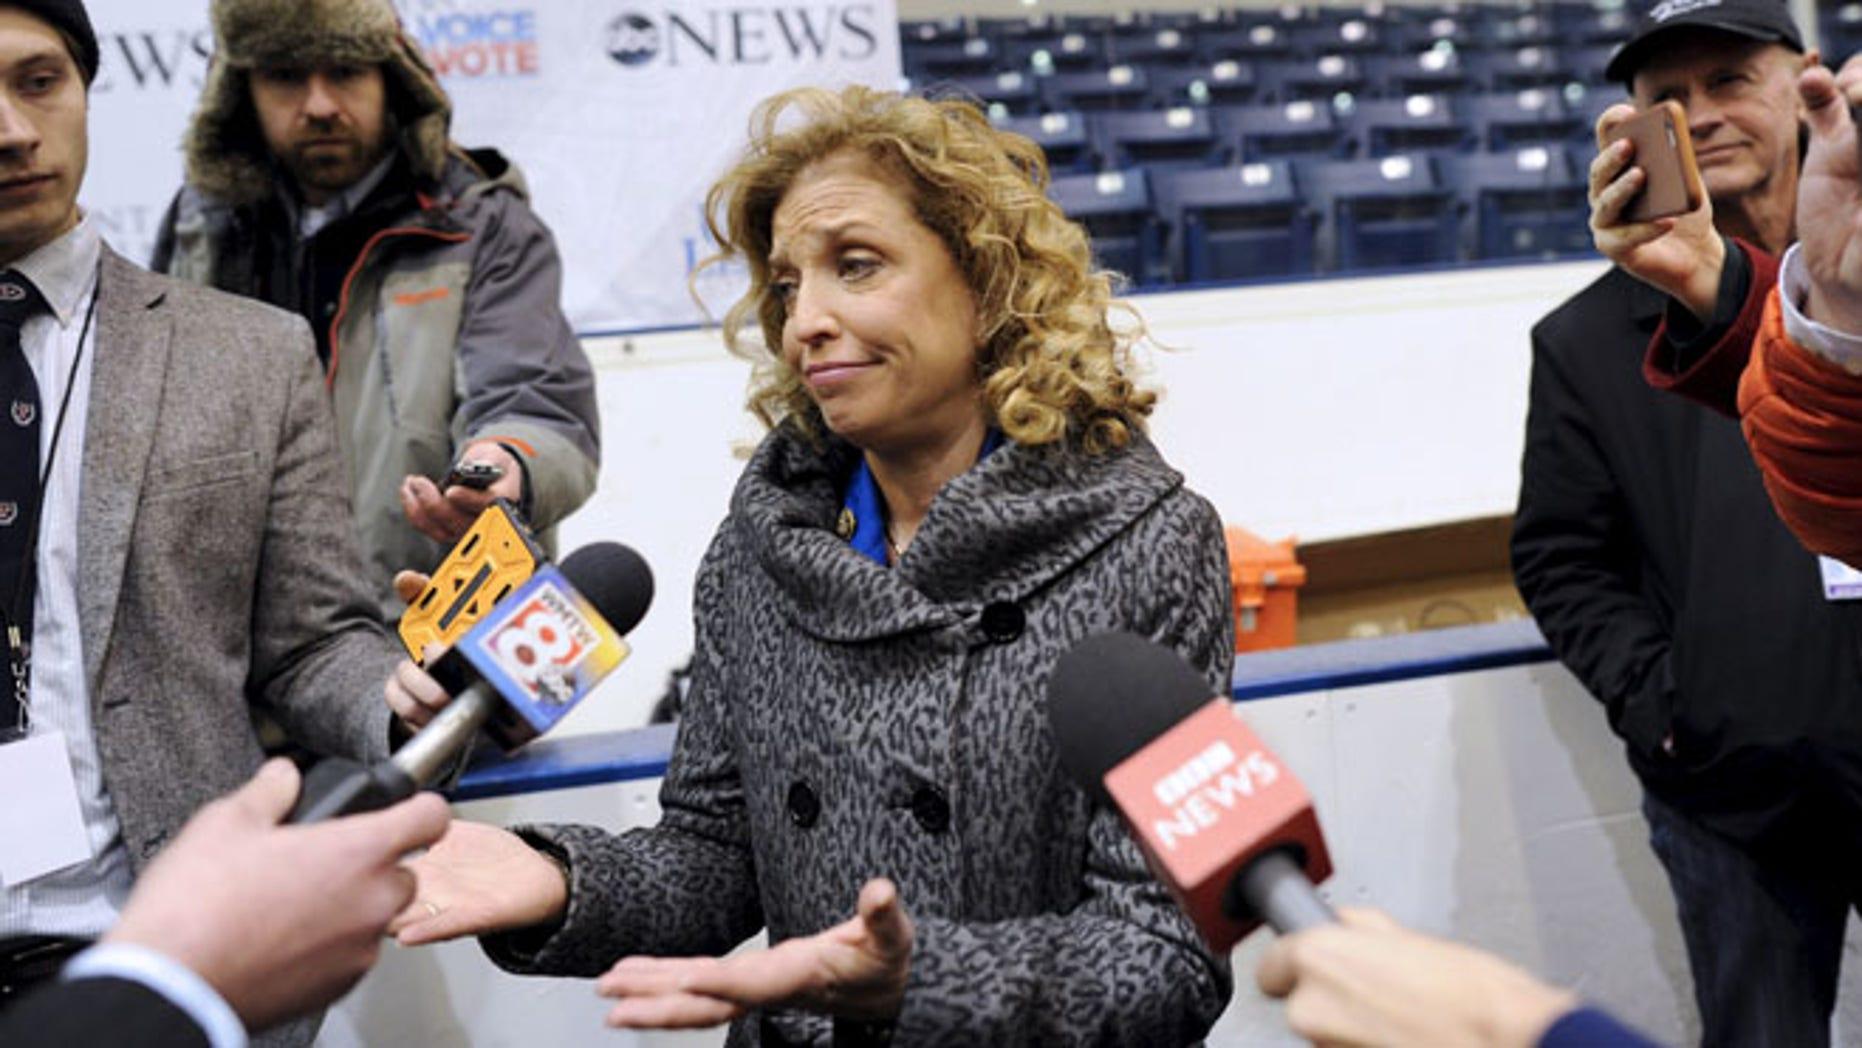 FILE:  Dec. 19, 2015: Democratic National Committee chair Debbie Wasserman Schultz at debate at Saint Anselm College in Manchester, N.H. (REUTERS)